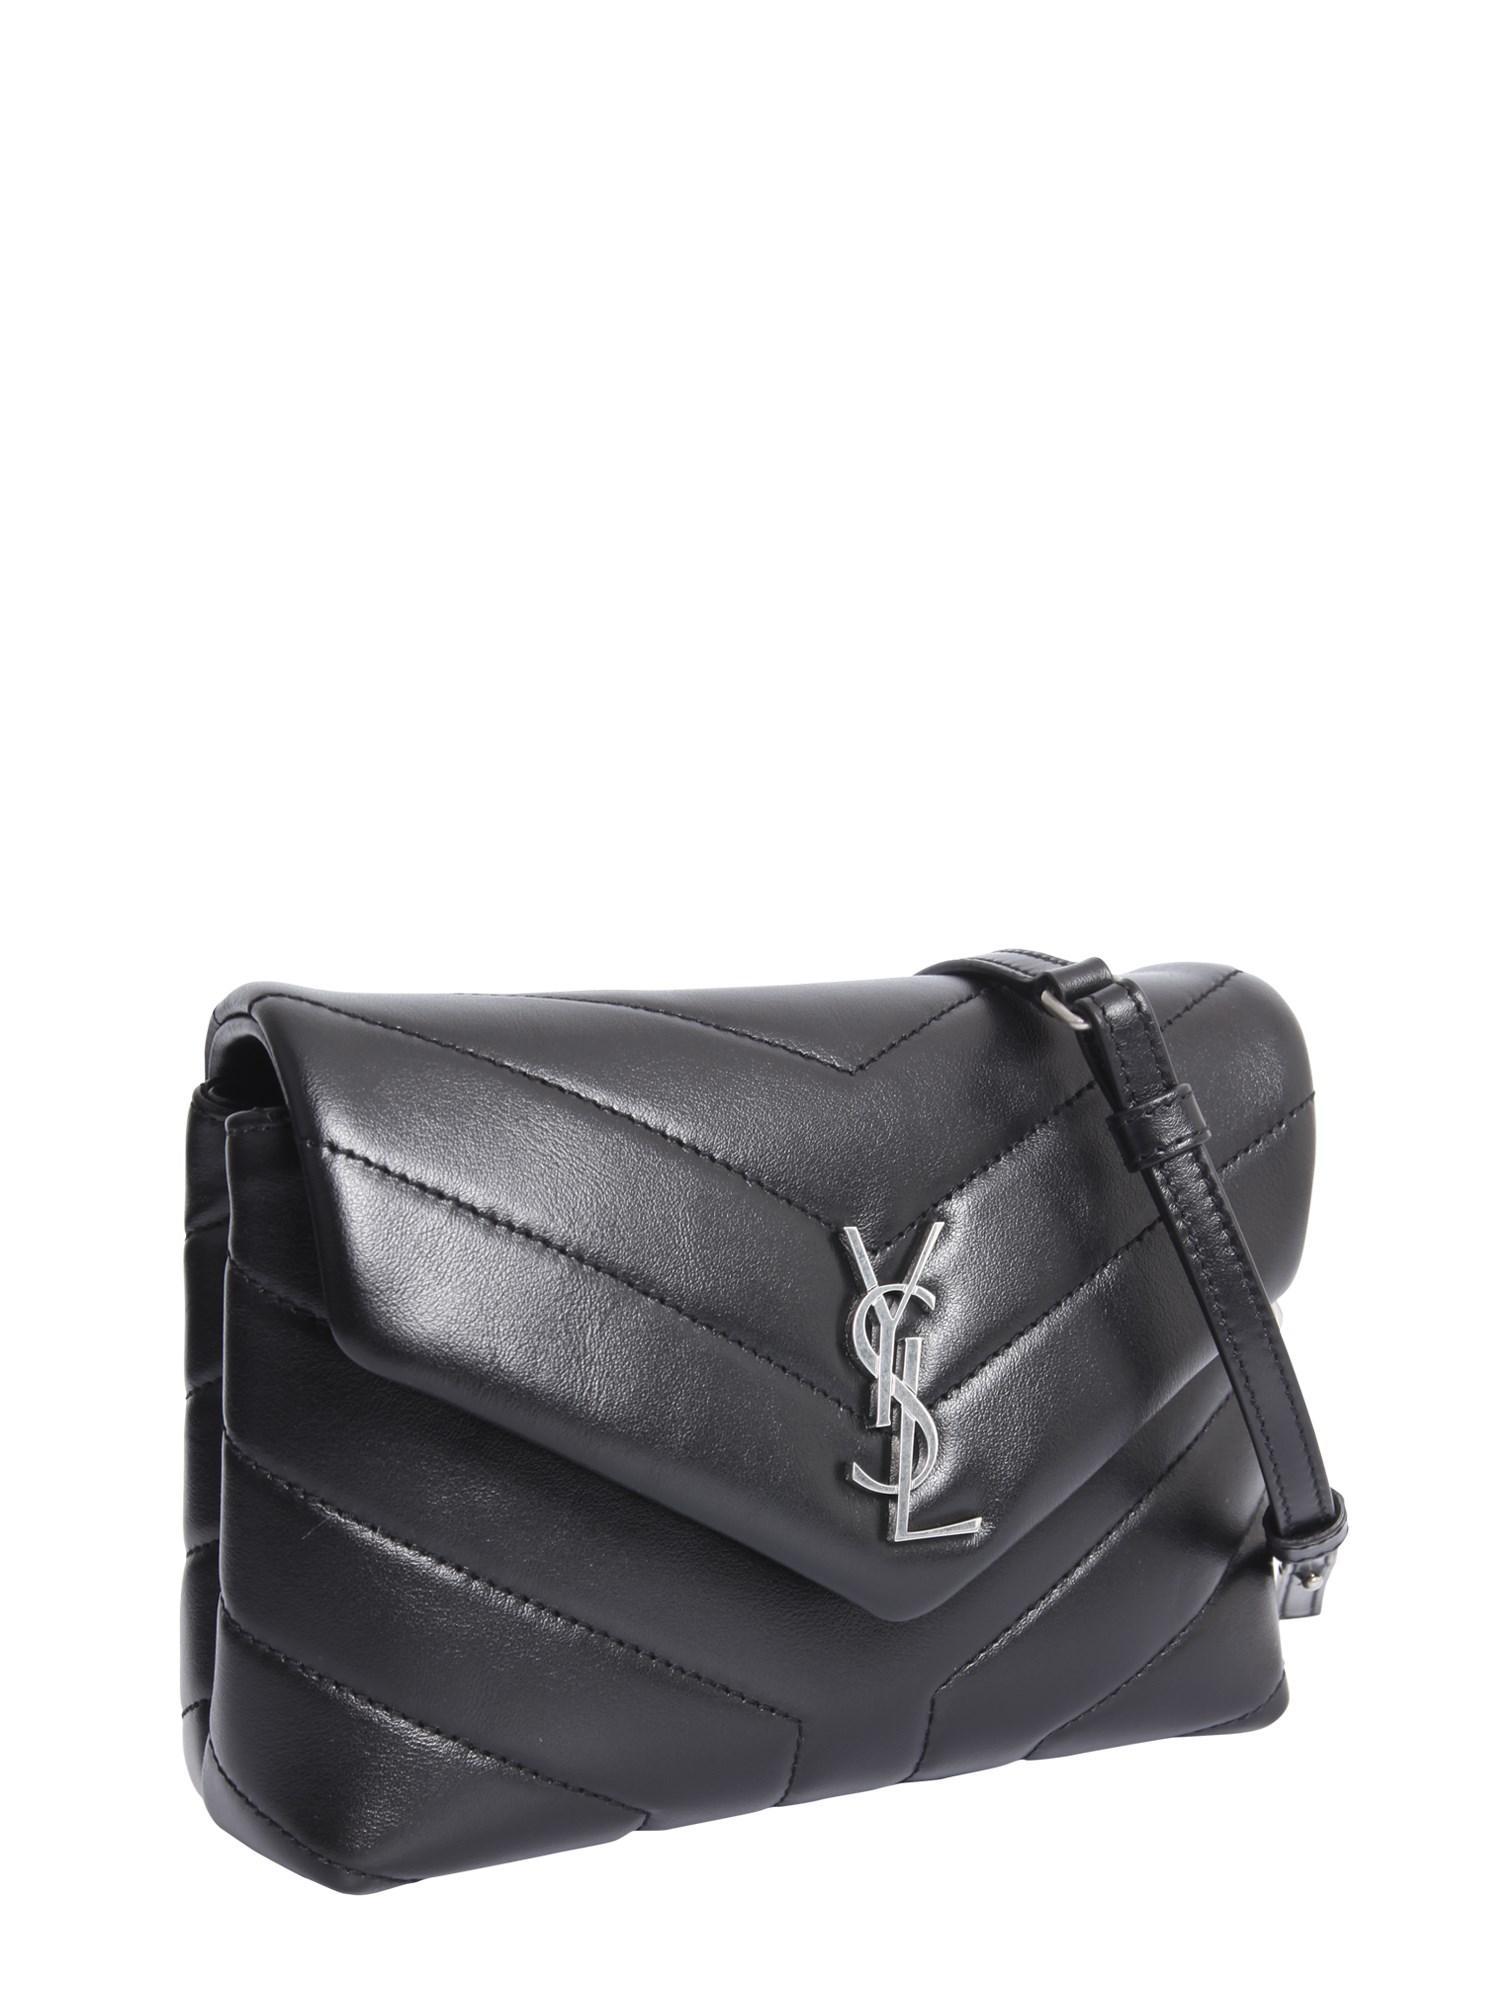 Saint Laurent - Black Loulou Toy Bag In